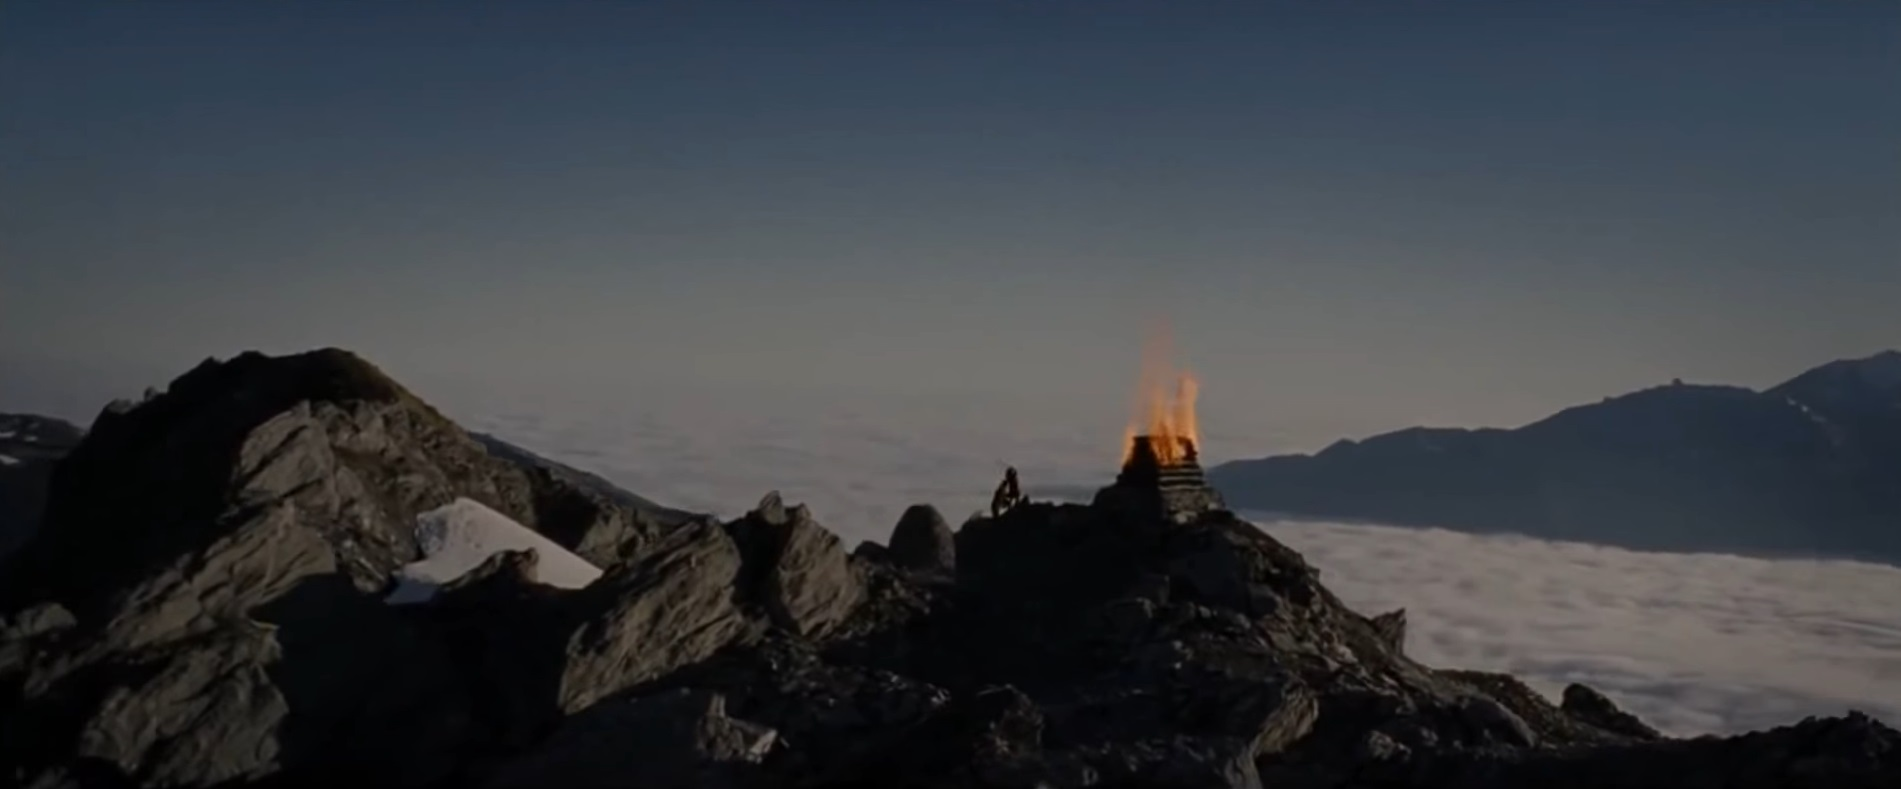 File:Beacon-hills of Gondor.jpeg